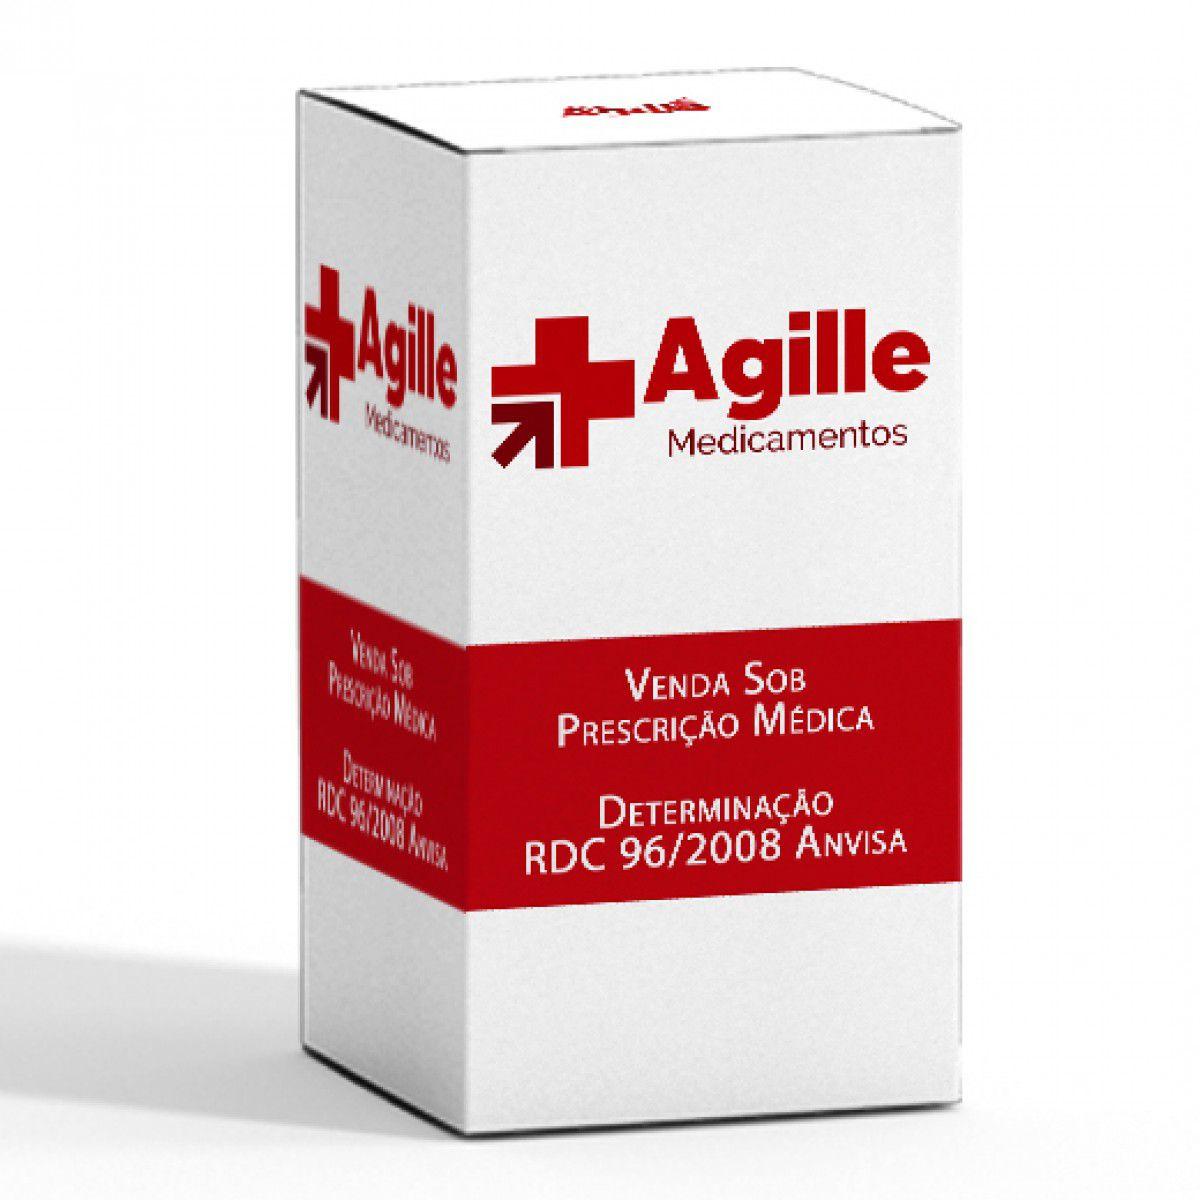 CLEXANE 60MG SOL INJ 2 SER X 0,6ML+SIST.SEGUR.  - Agille Speciality